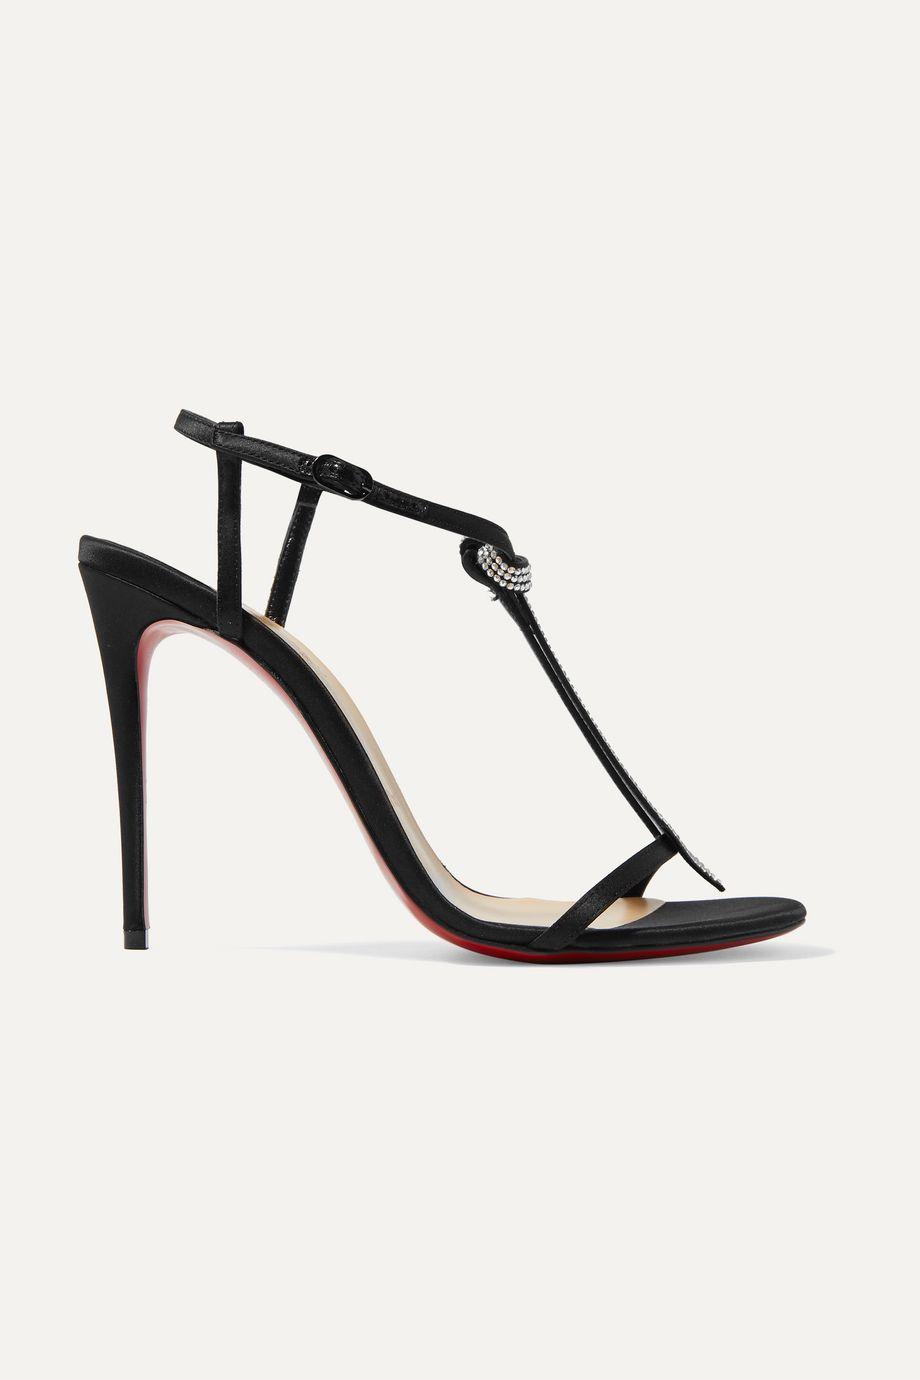 Christian Louboutin T Cab 100 crystal-embellished satin sandals